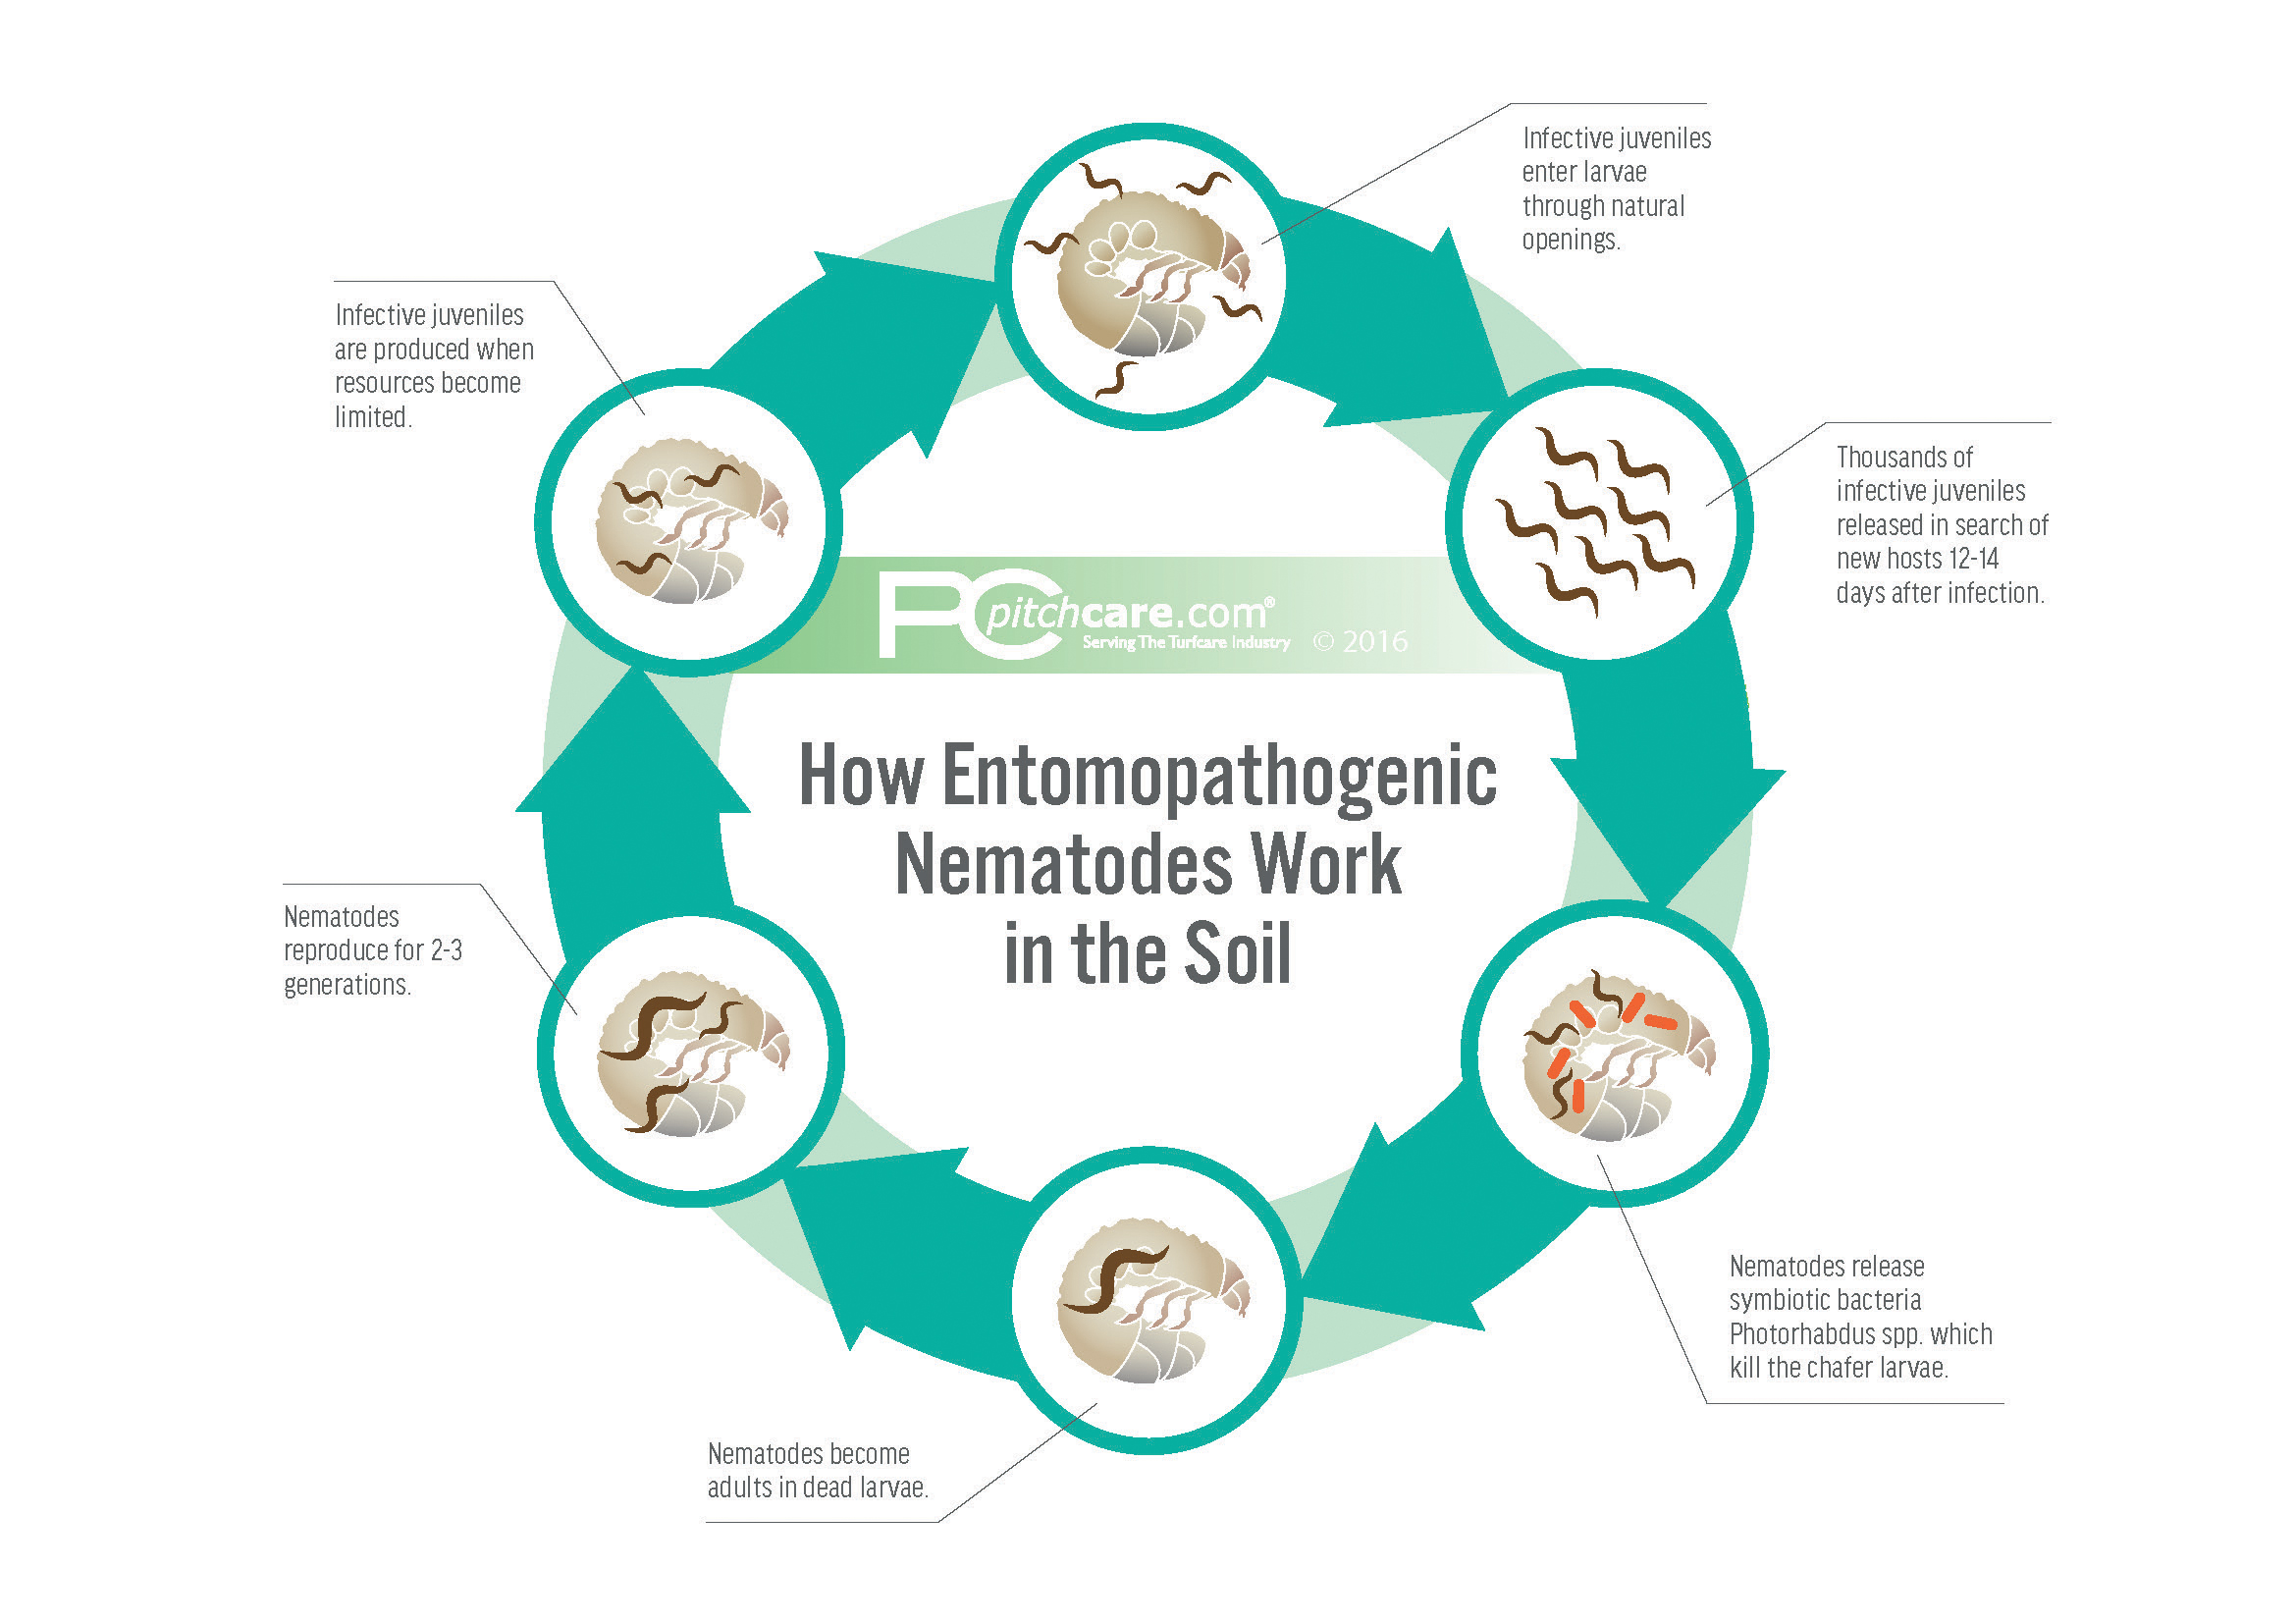 Nemasys chafer grub killer 500sqm biological pest for Soil life cycle